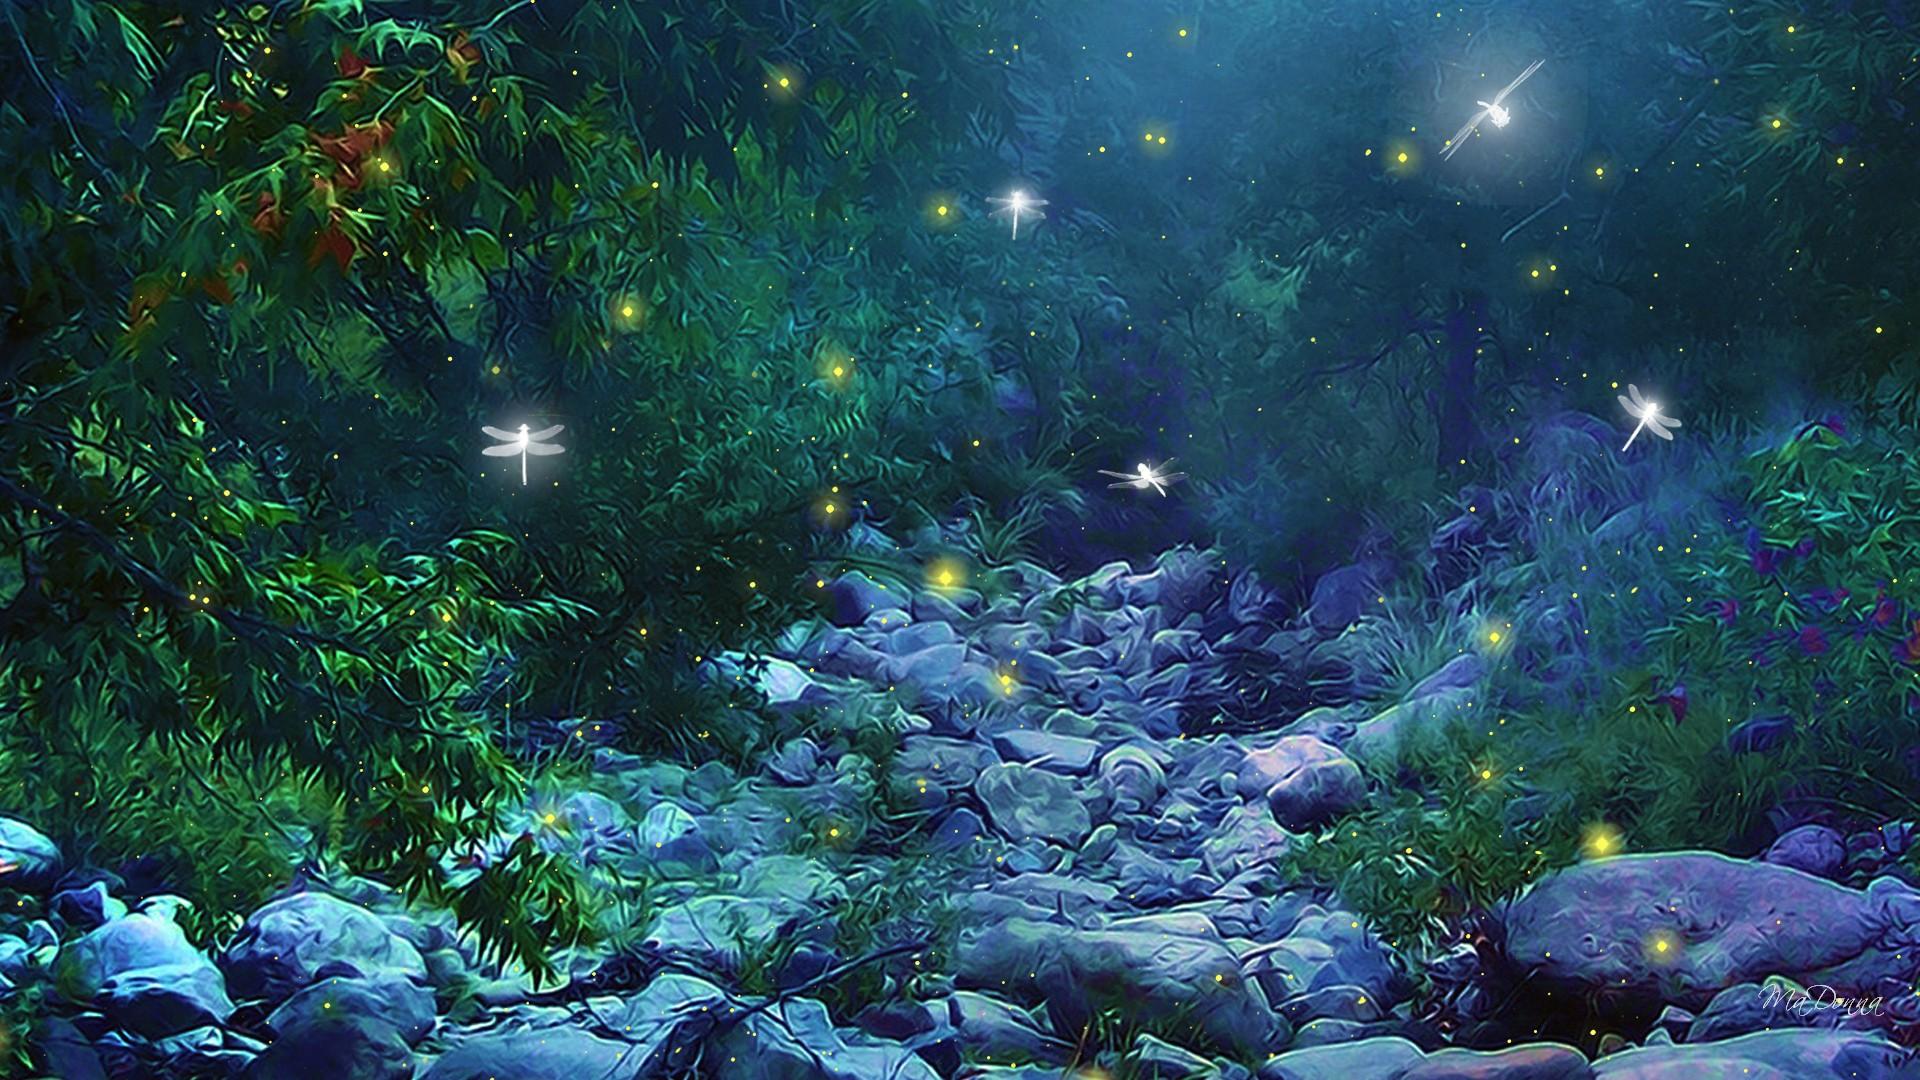 HD-Summer-Fireflies-Dragonflies-Full-HD-1920x1080-or-1920x-background-image-wallpa-wallpaper-wp3806390